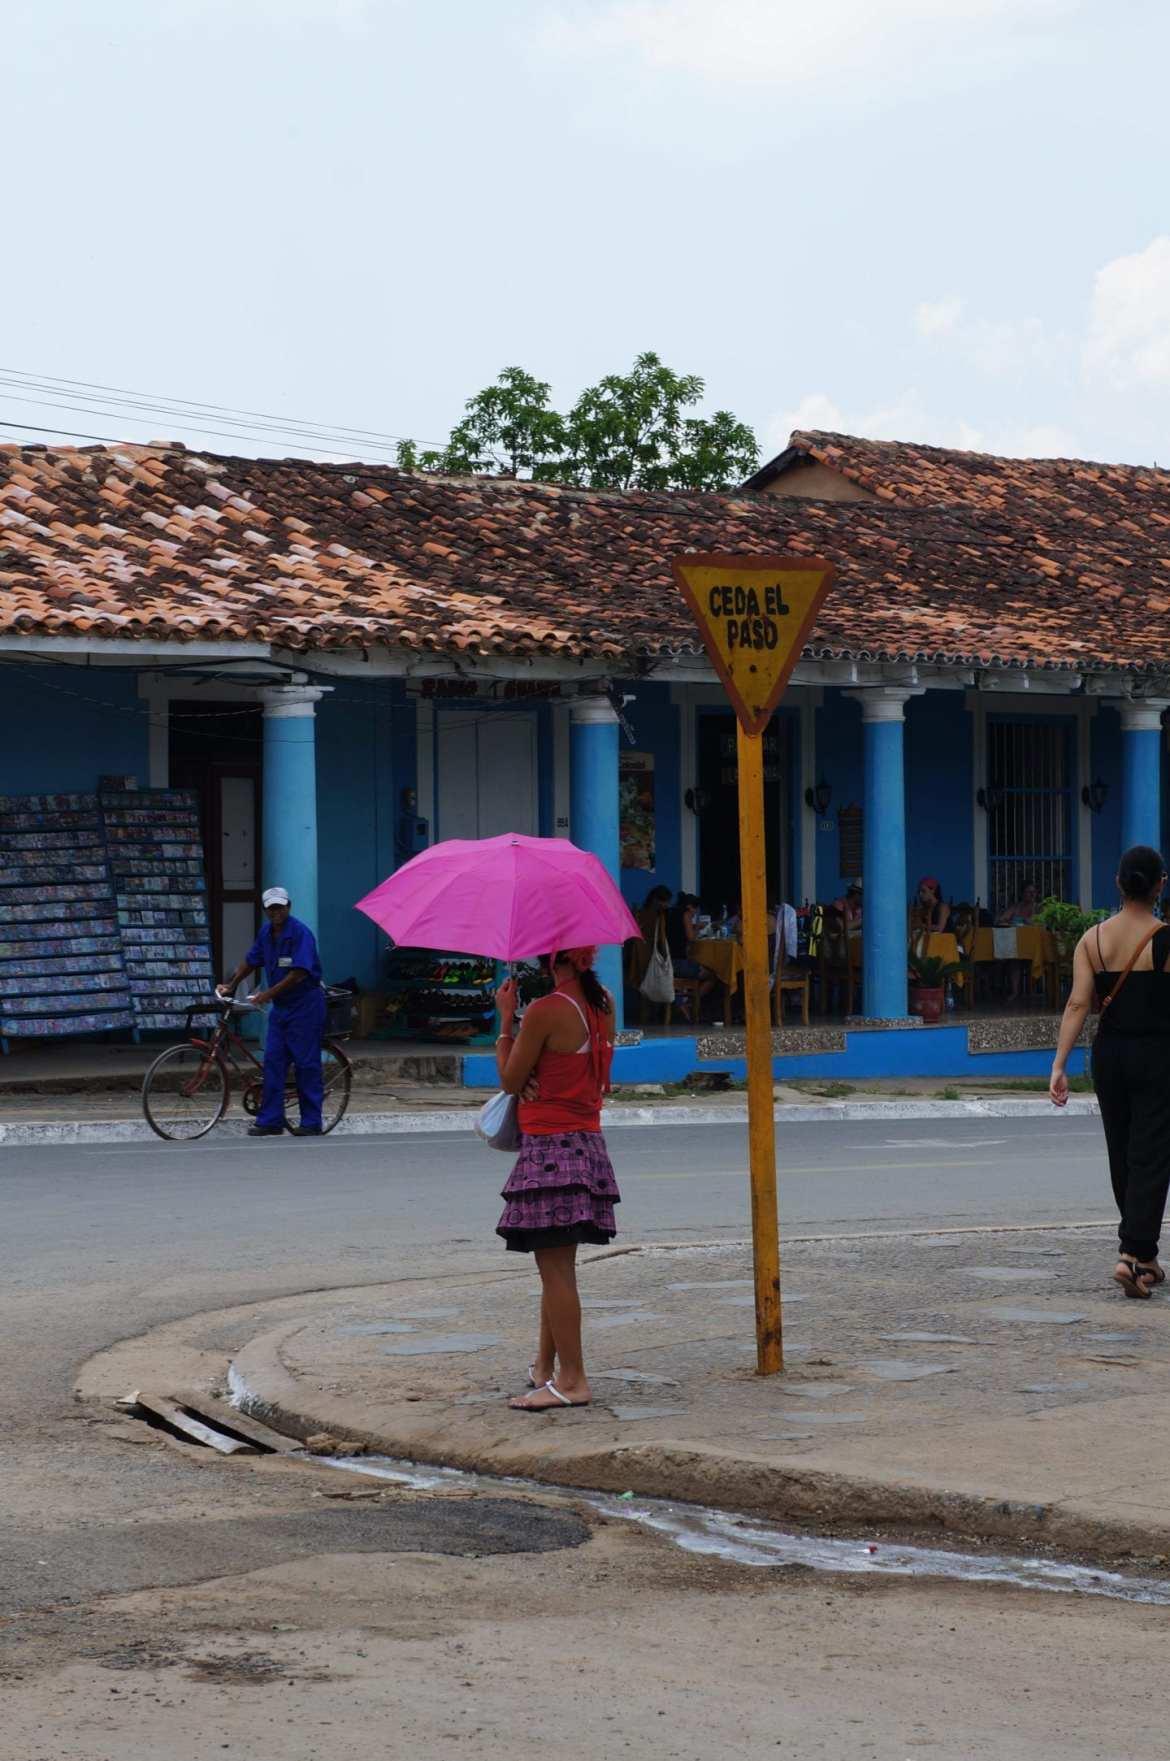 street scene in vinales, cuba